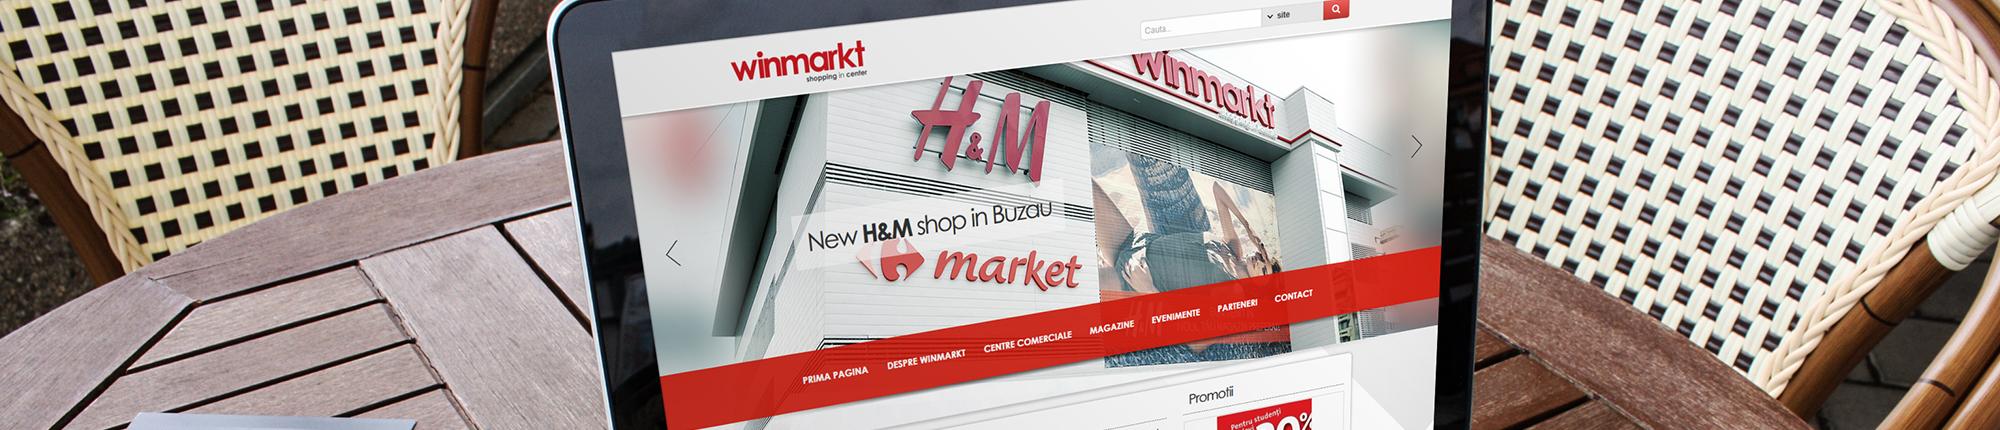 winmarkt-site0